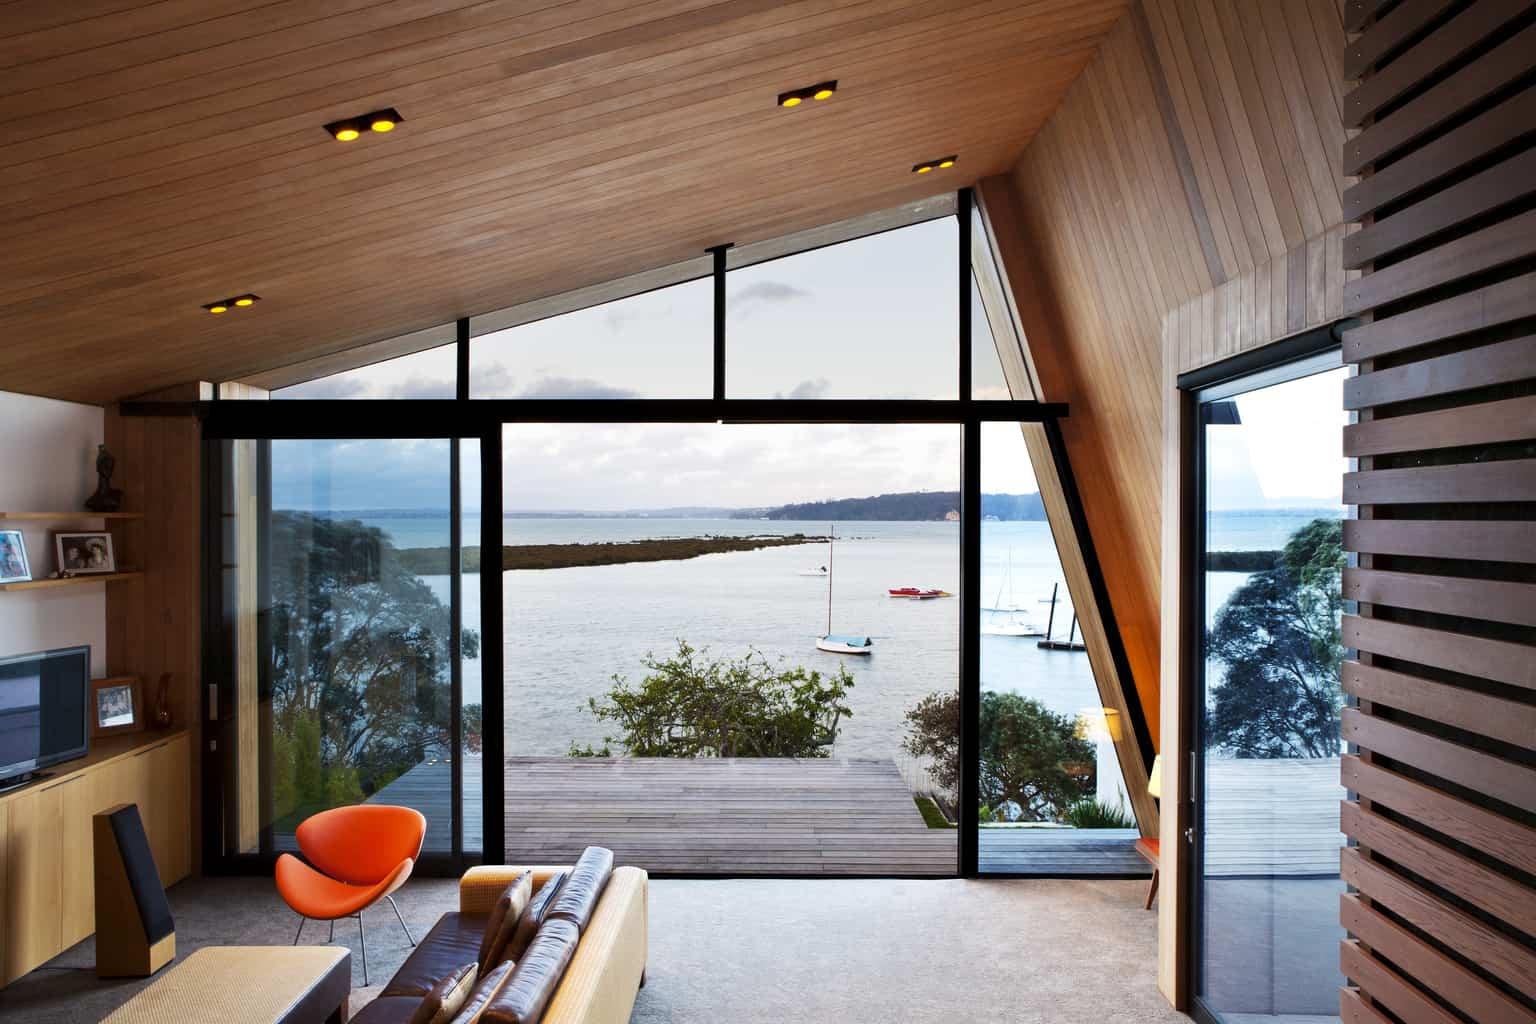 Zinc + cedar architecture with a view